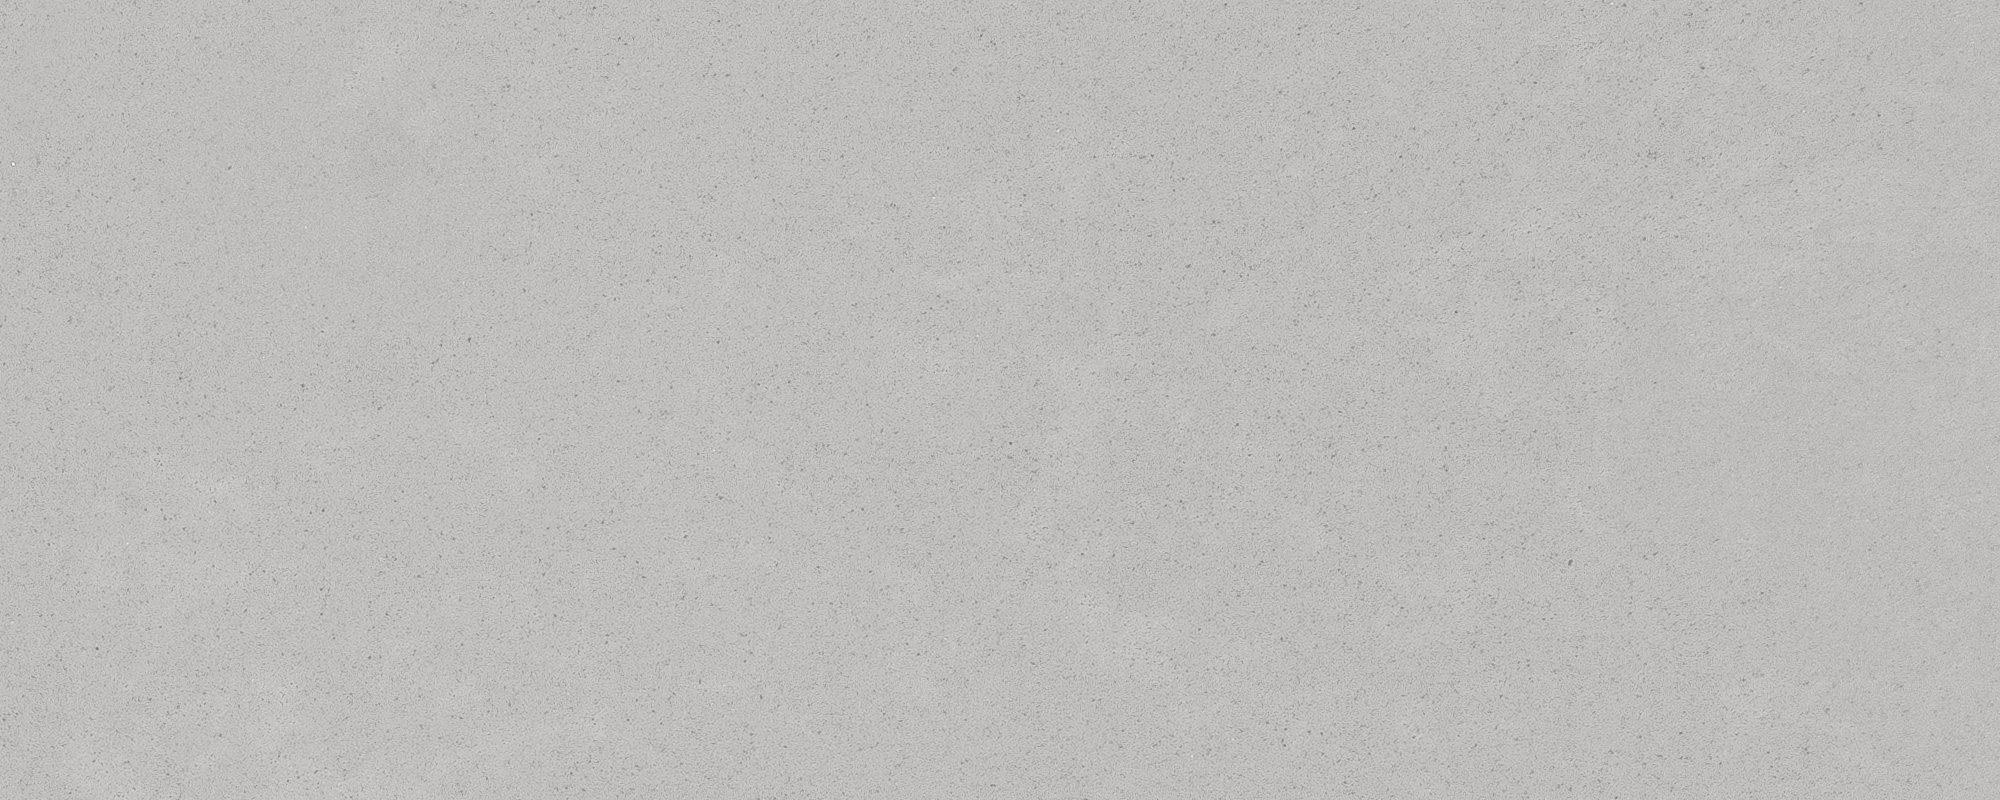 Zement Ice Quartz Texture